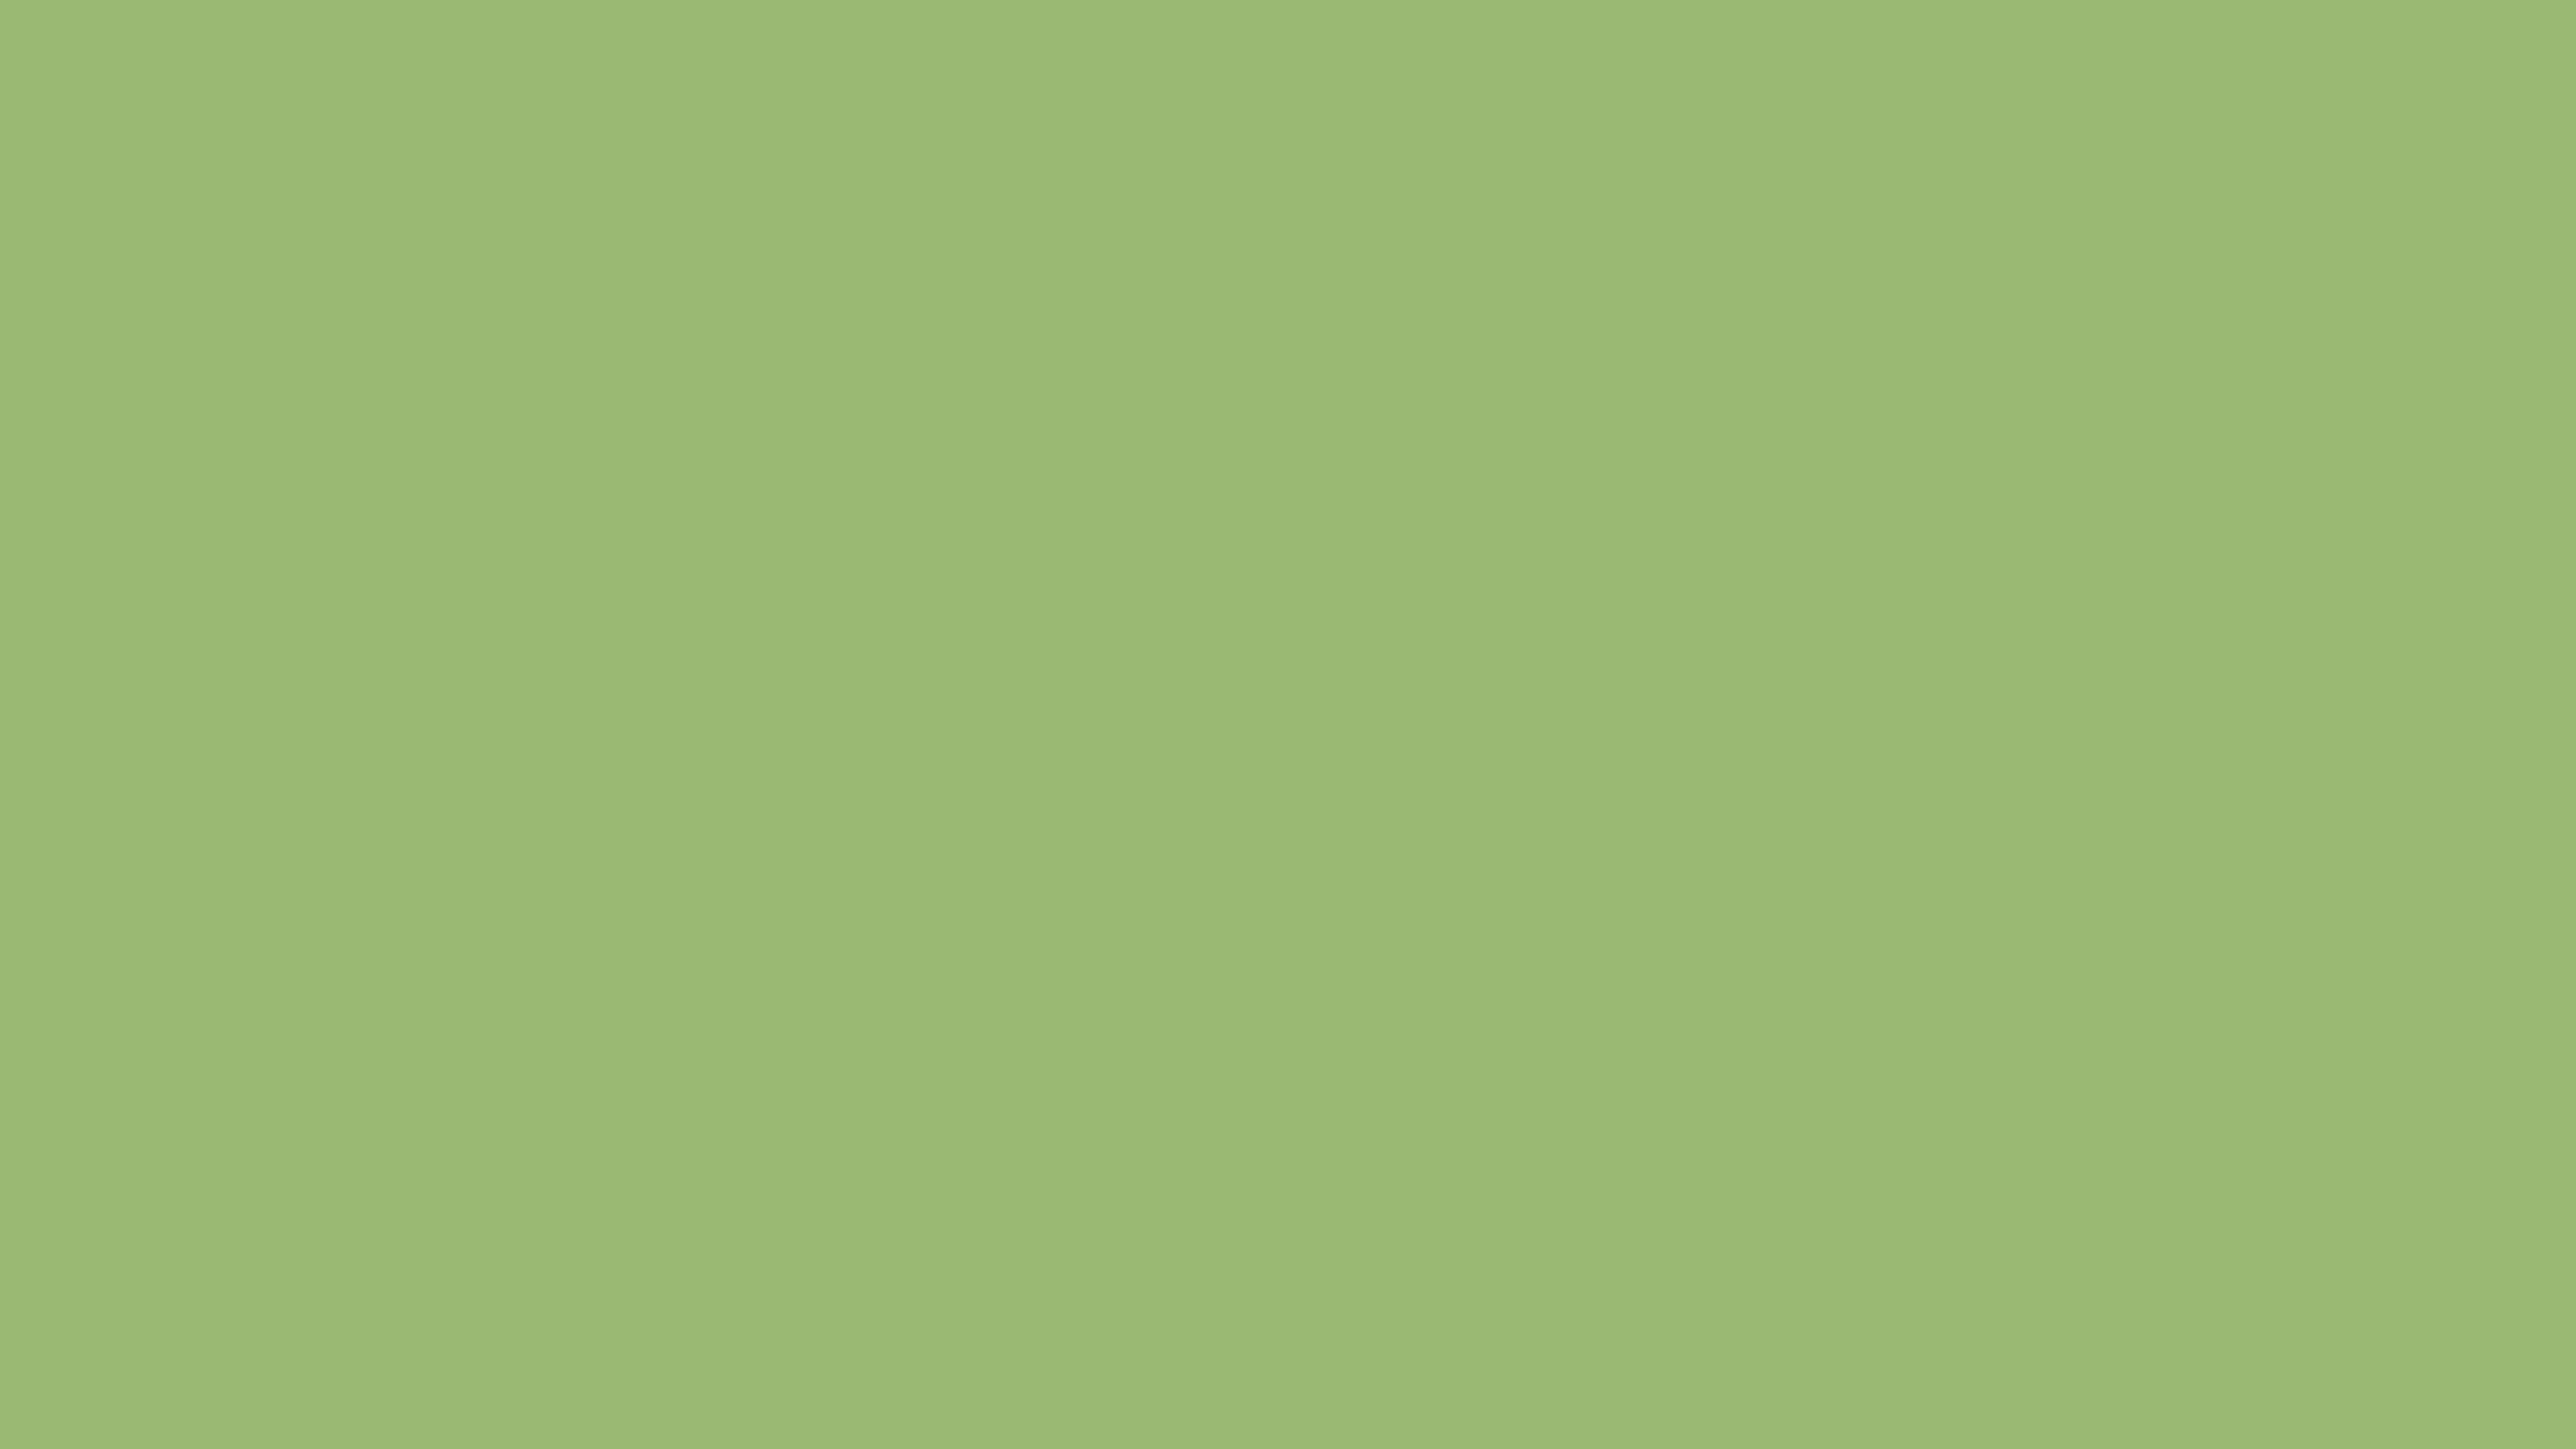 5120x2880 Olivine Solid Color Background